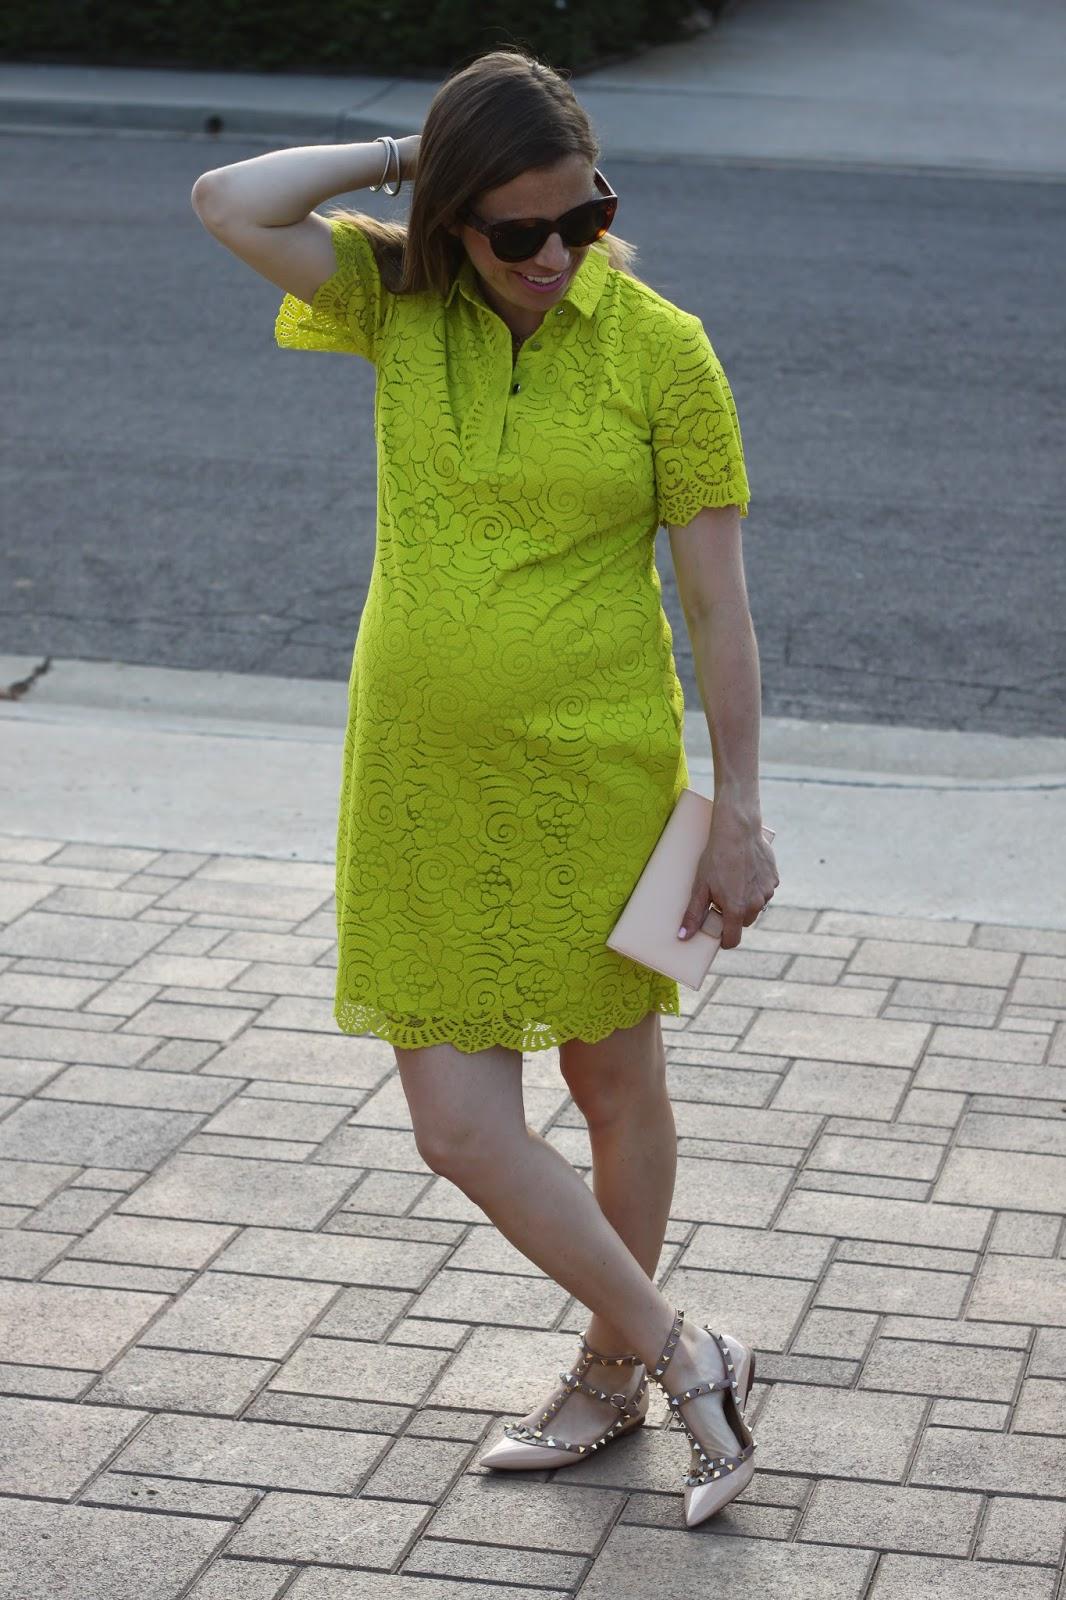 maternity lace dress and rockstuds